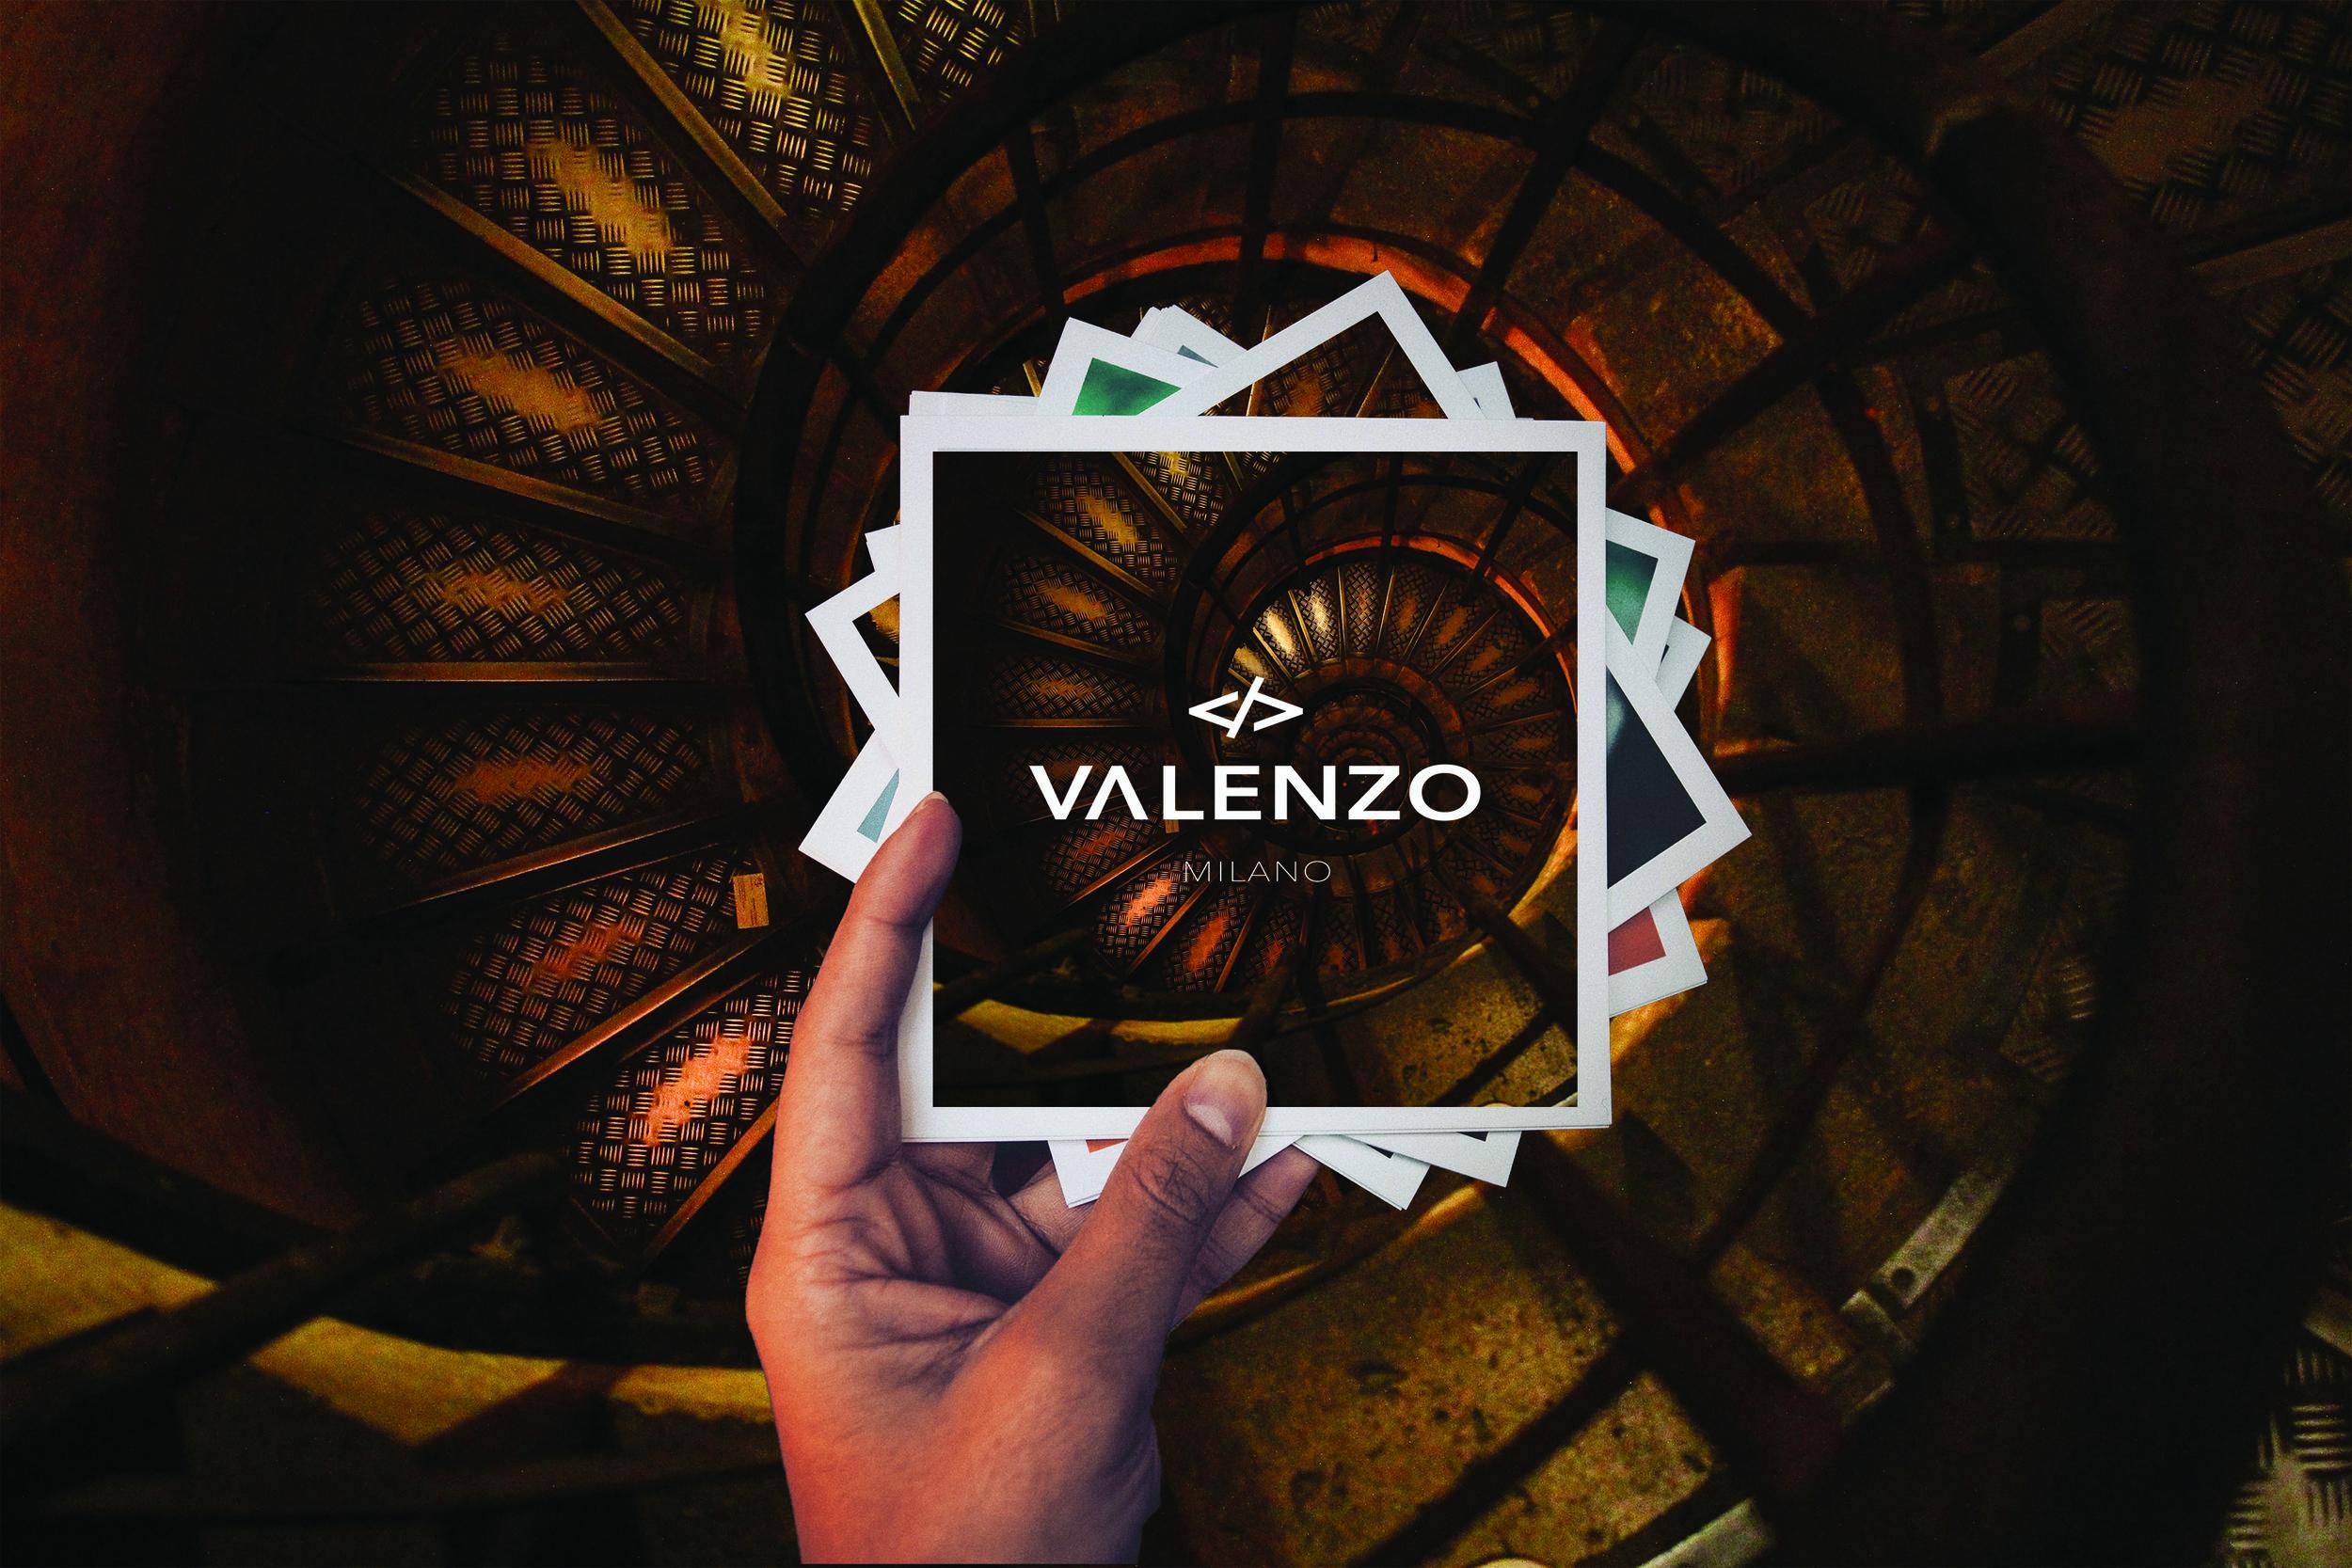 Zandríc Creative Projects x Valenzo - Branding in NYC